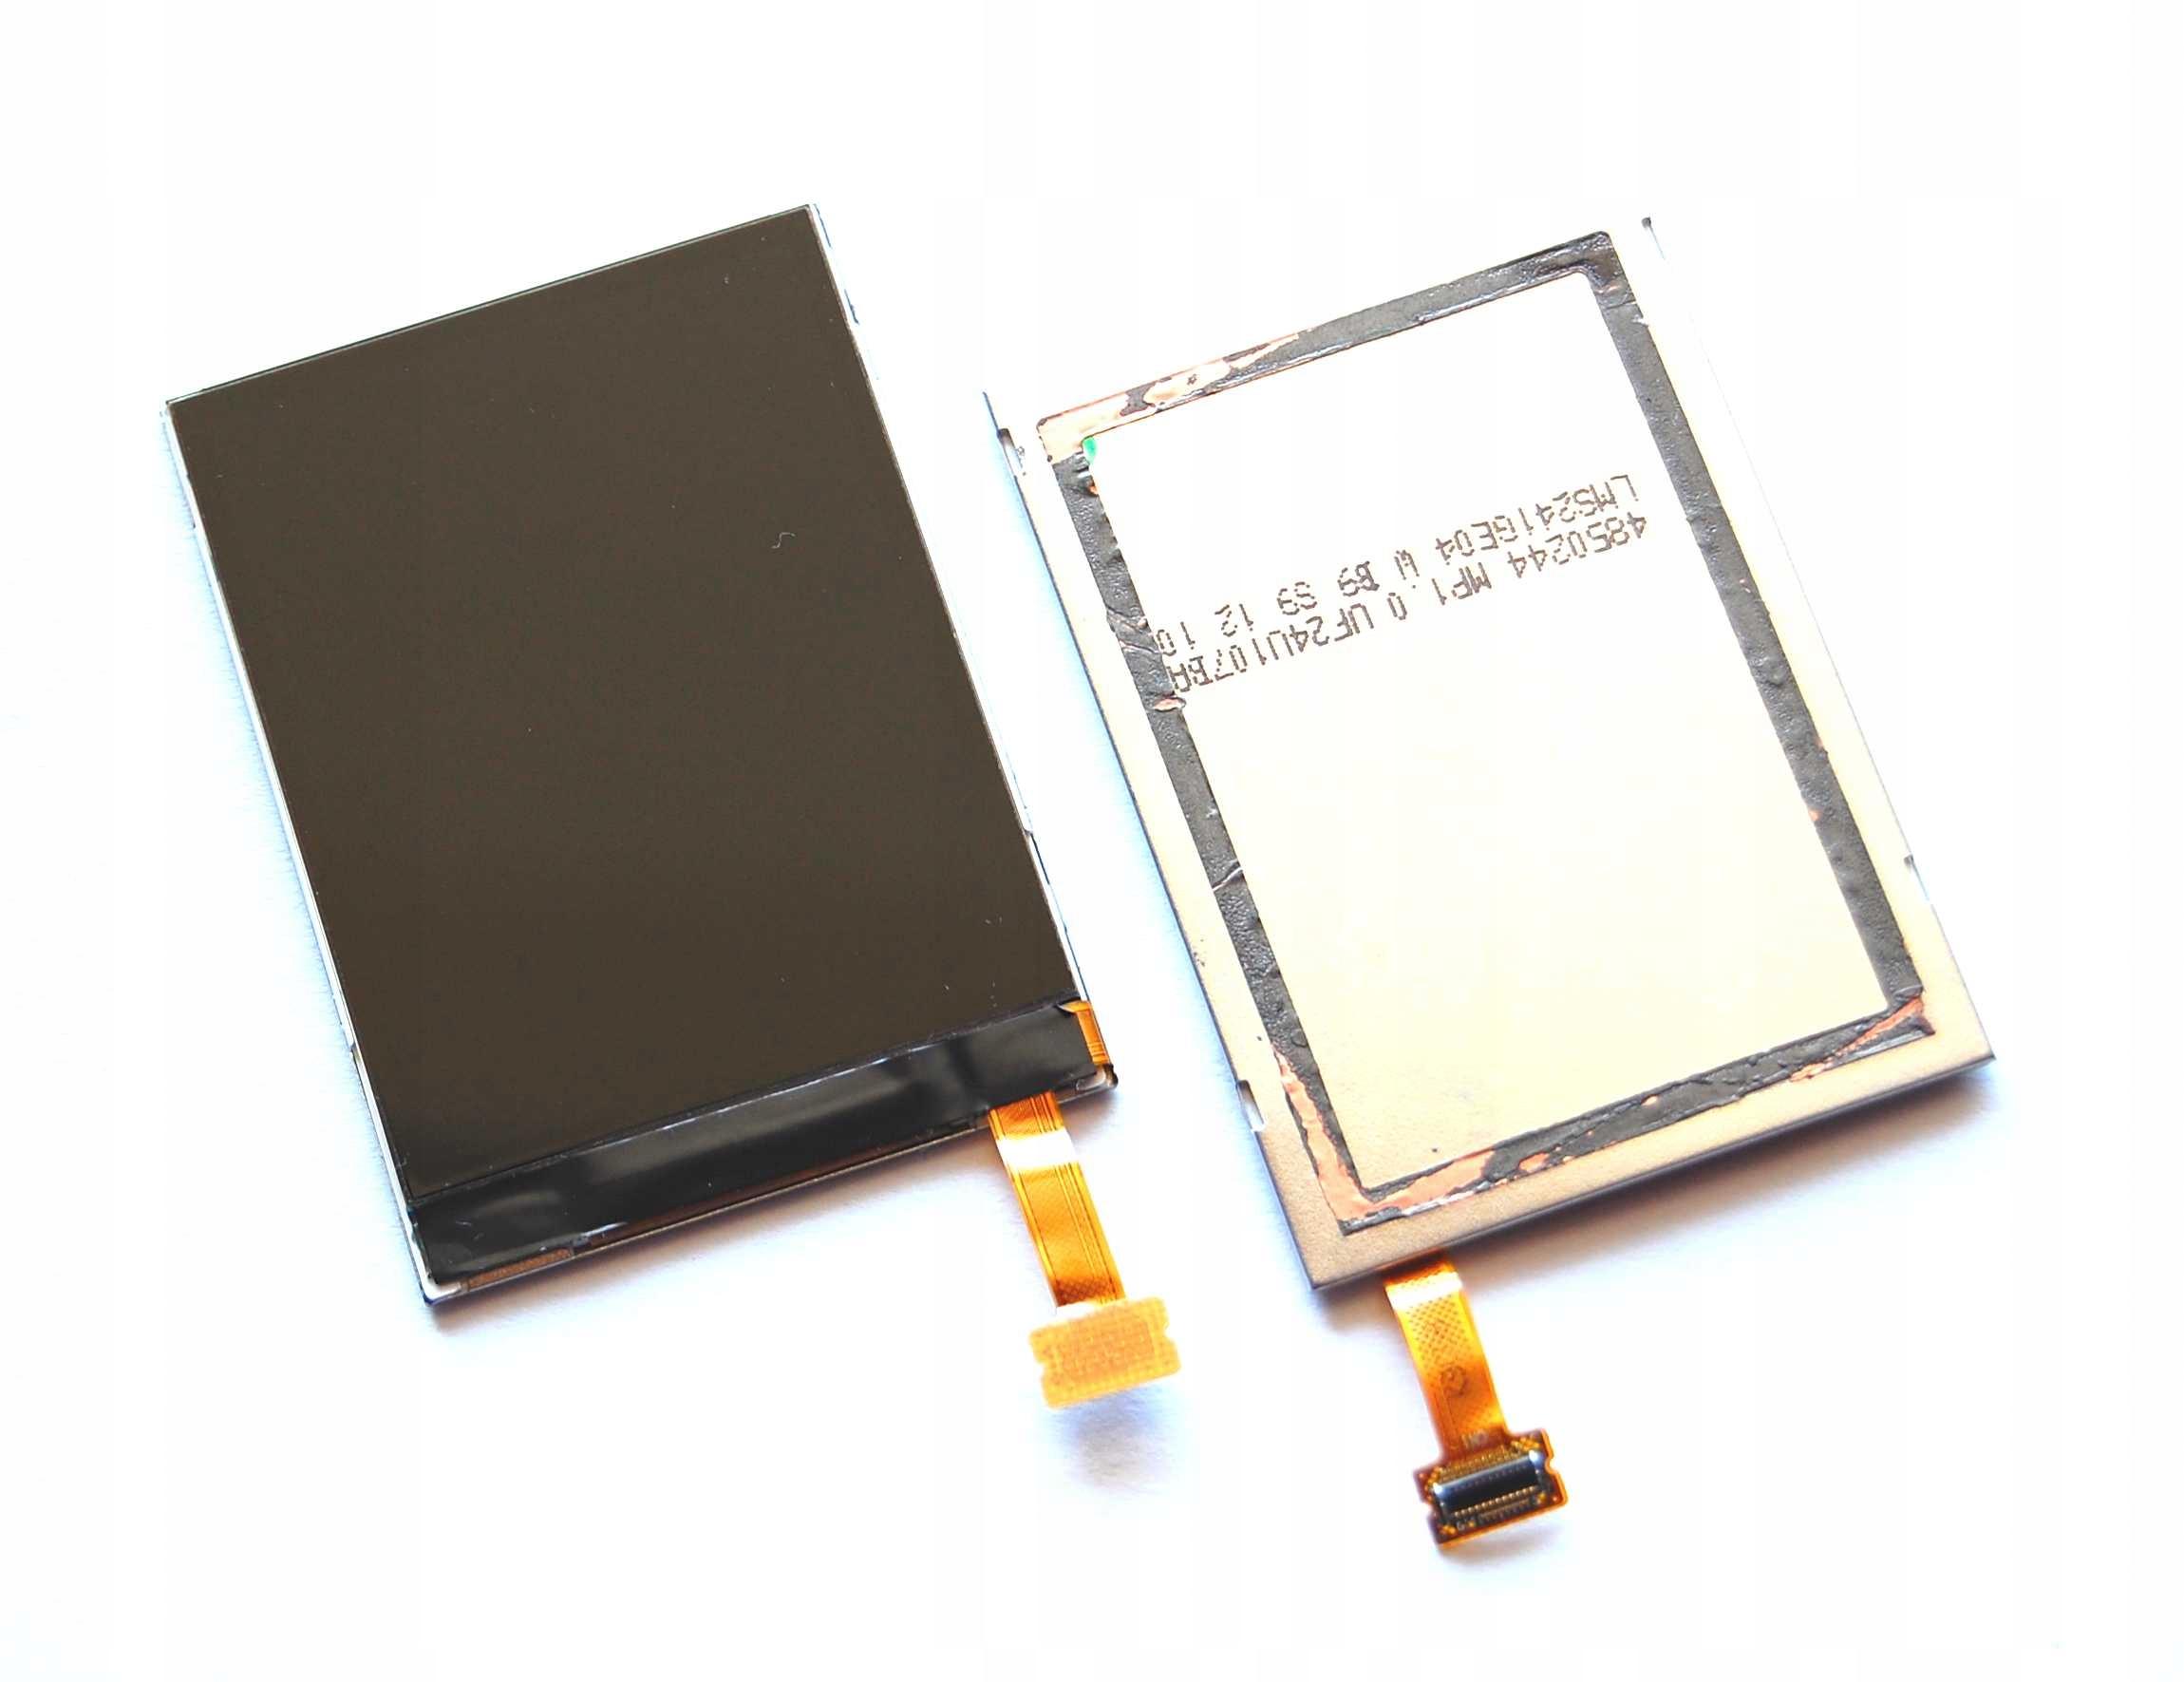 ORYG WYŚWIETLACZ LCD NOKIA E52 E66 E75 N82 6210